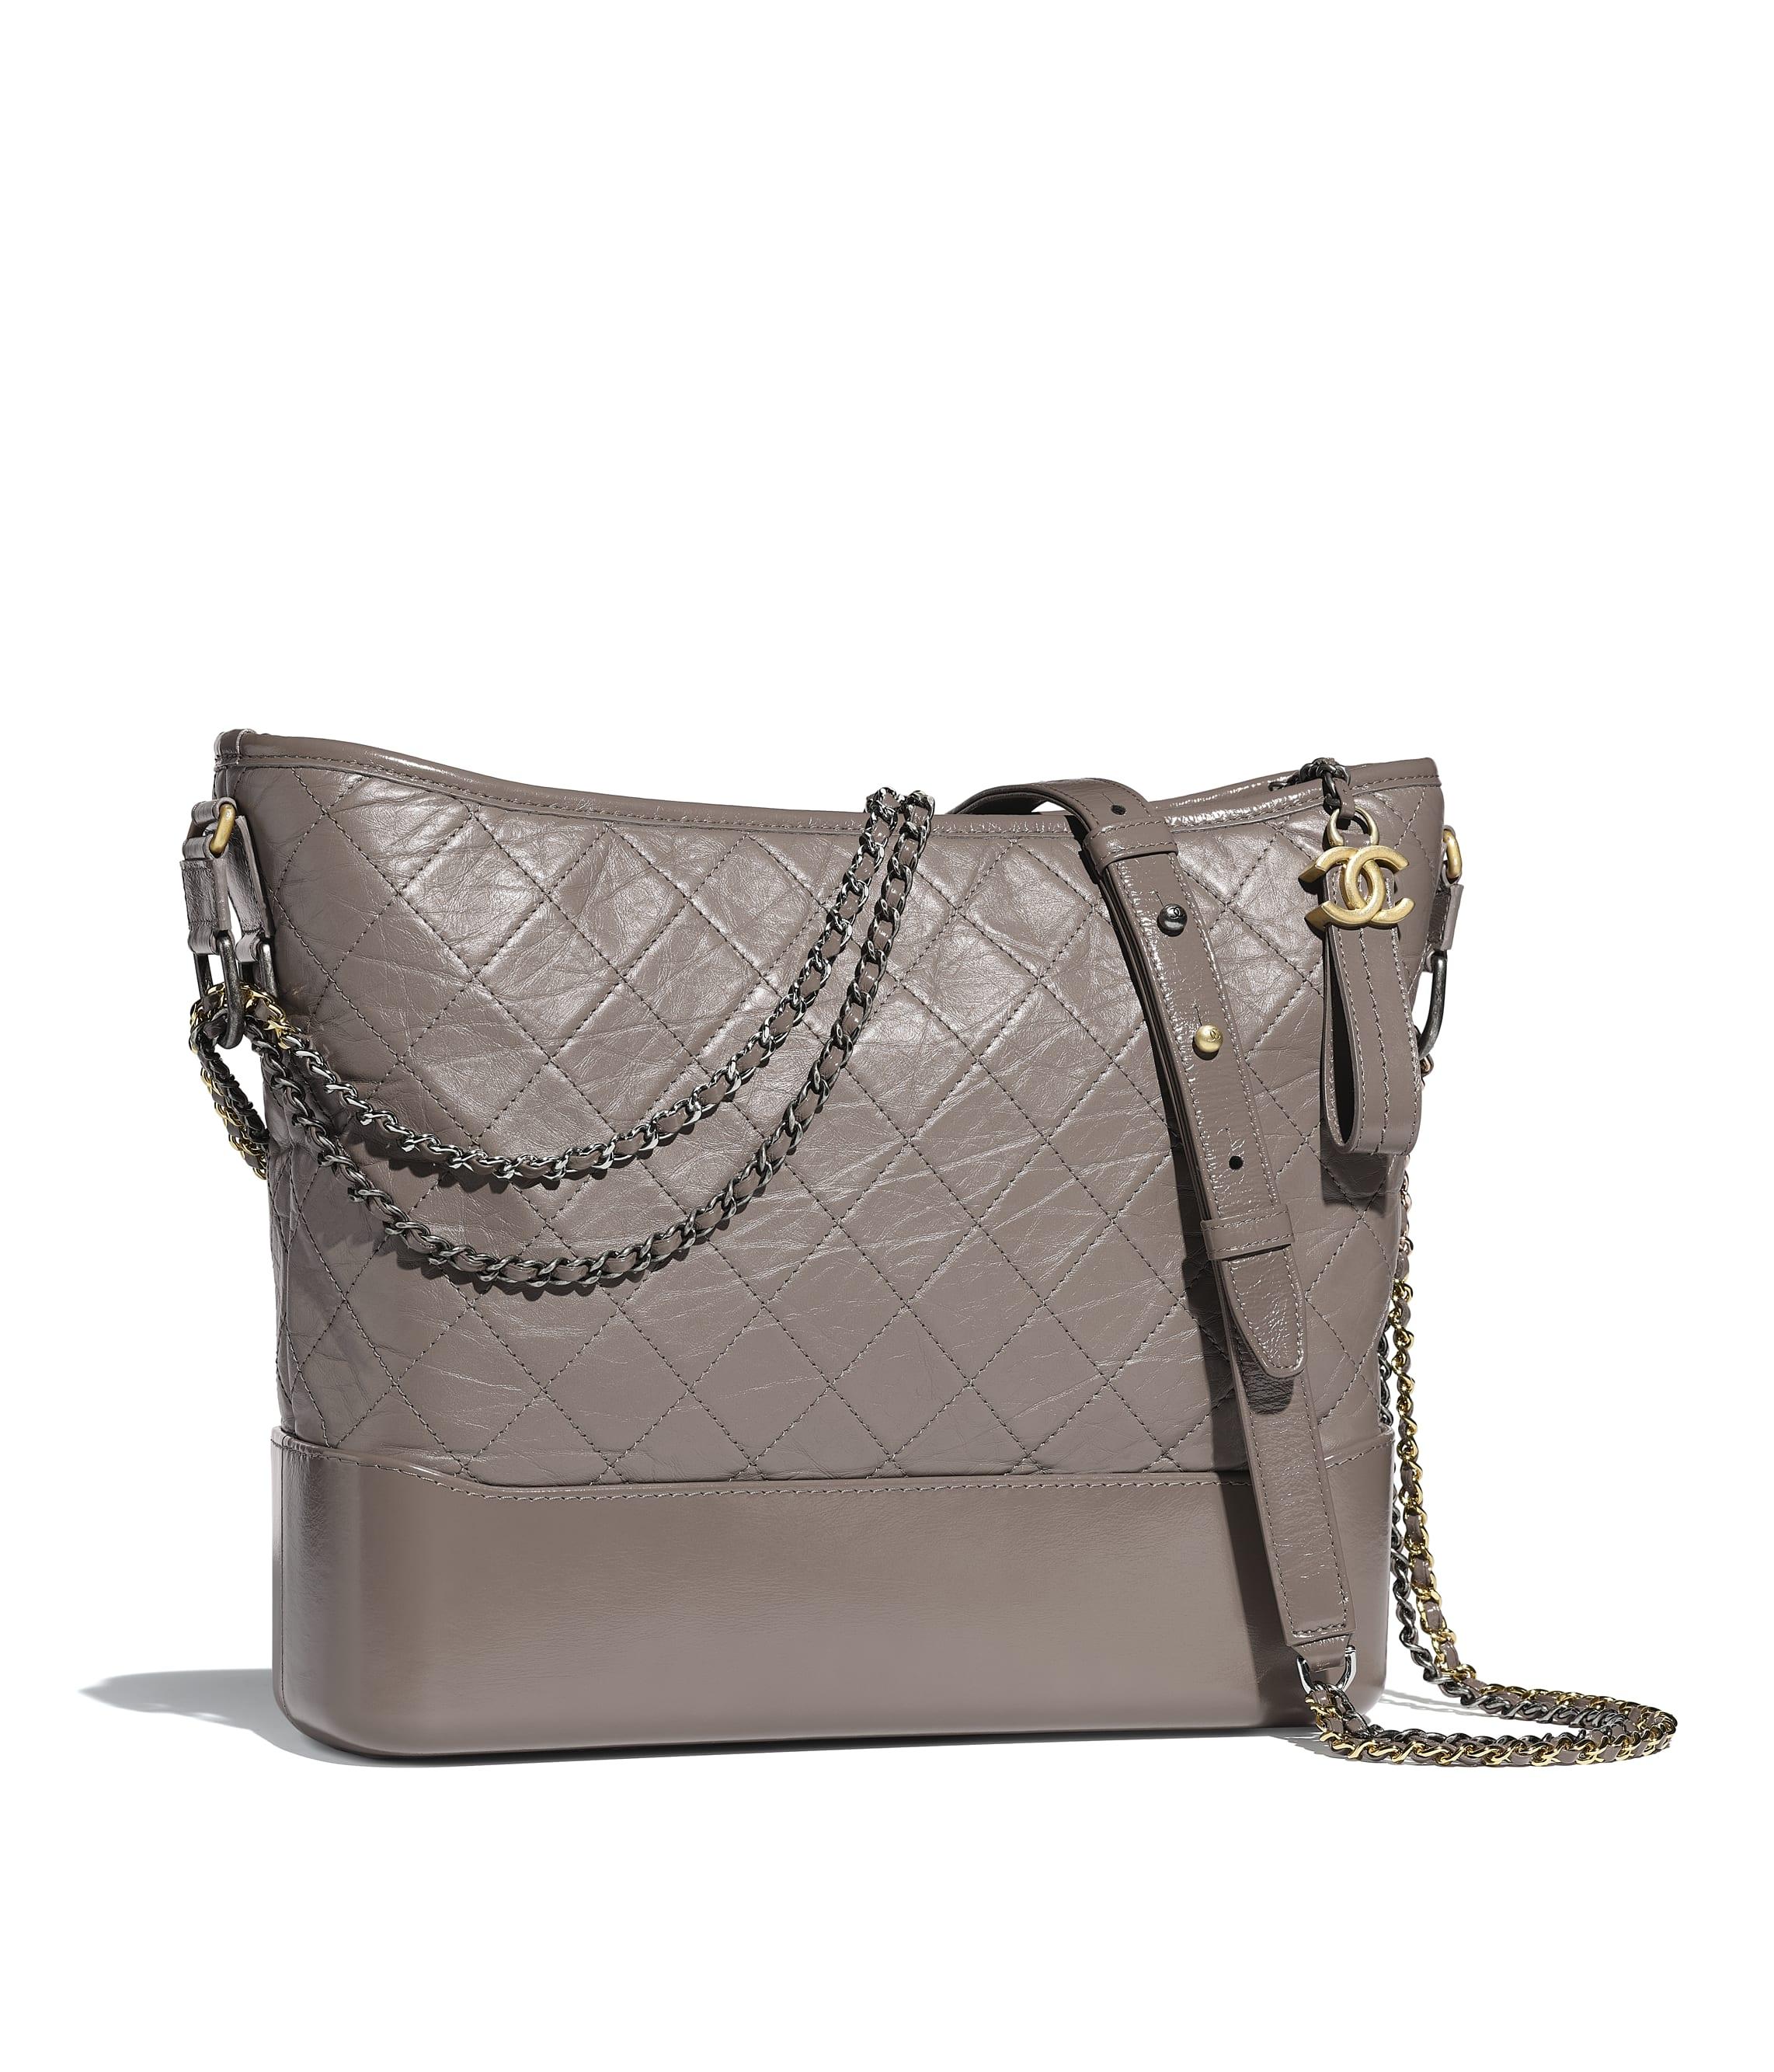 Chanel S Gabrielle Large Hobo Bag